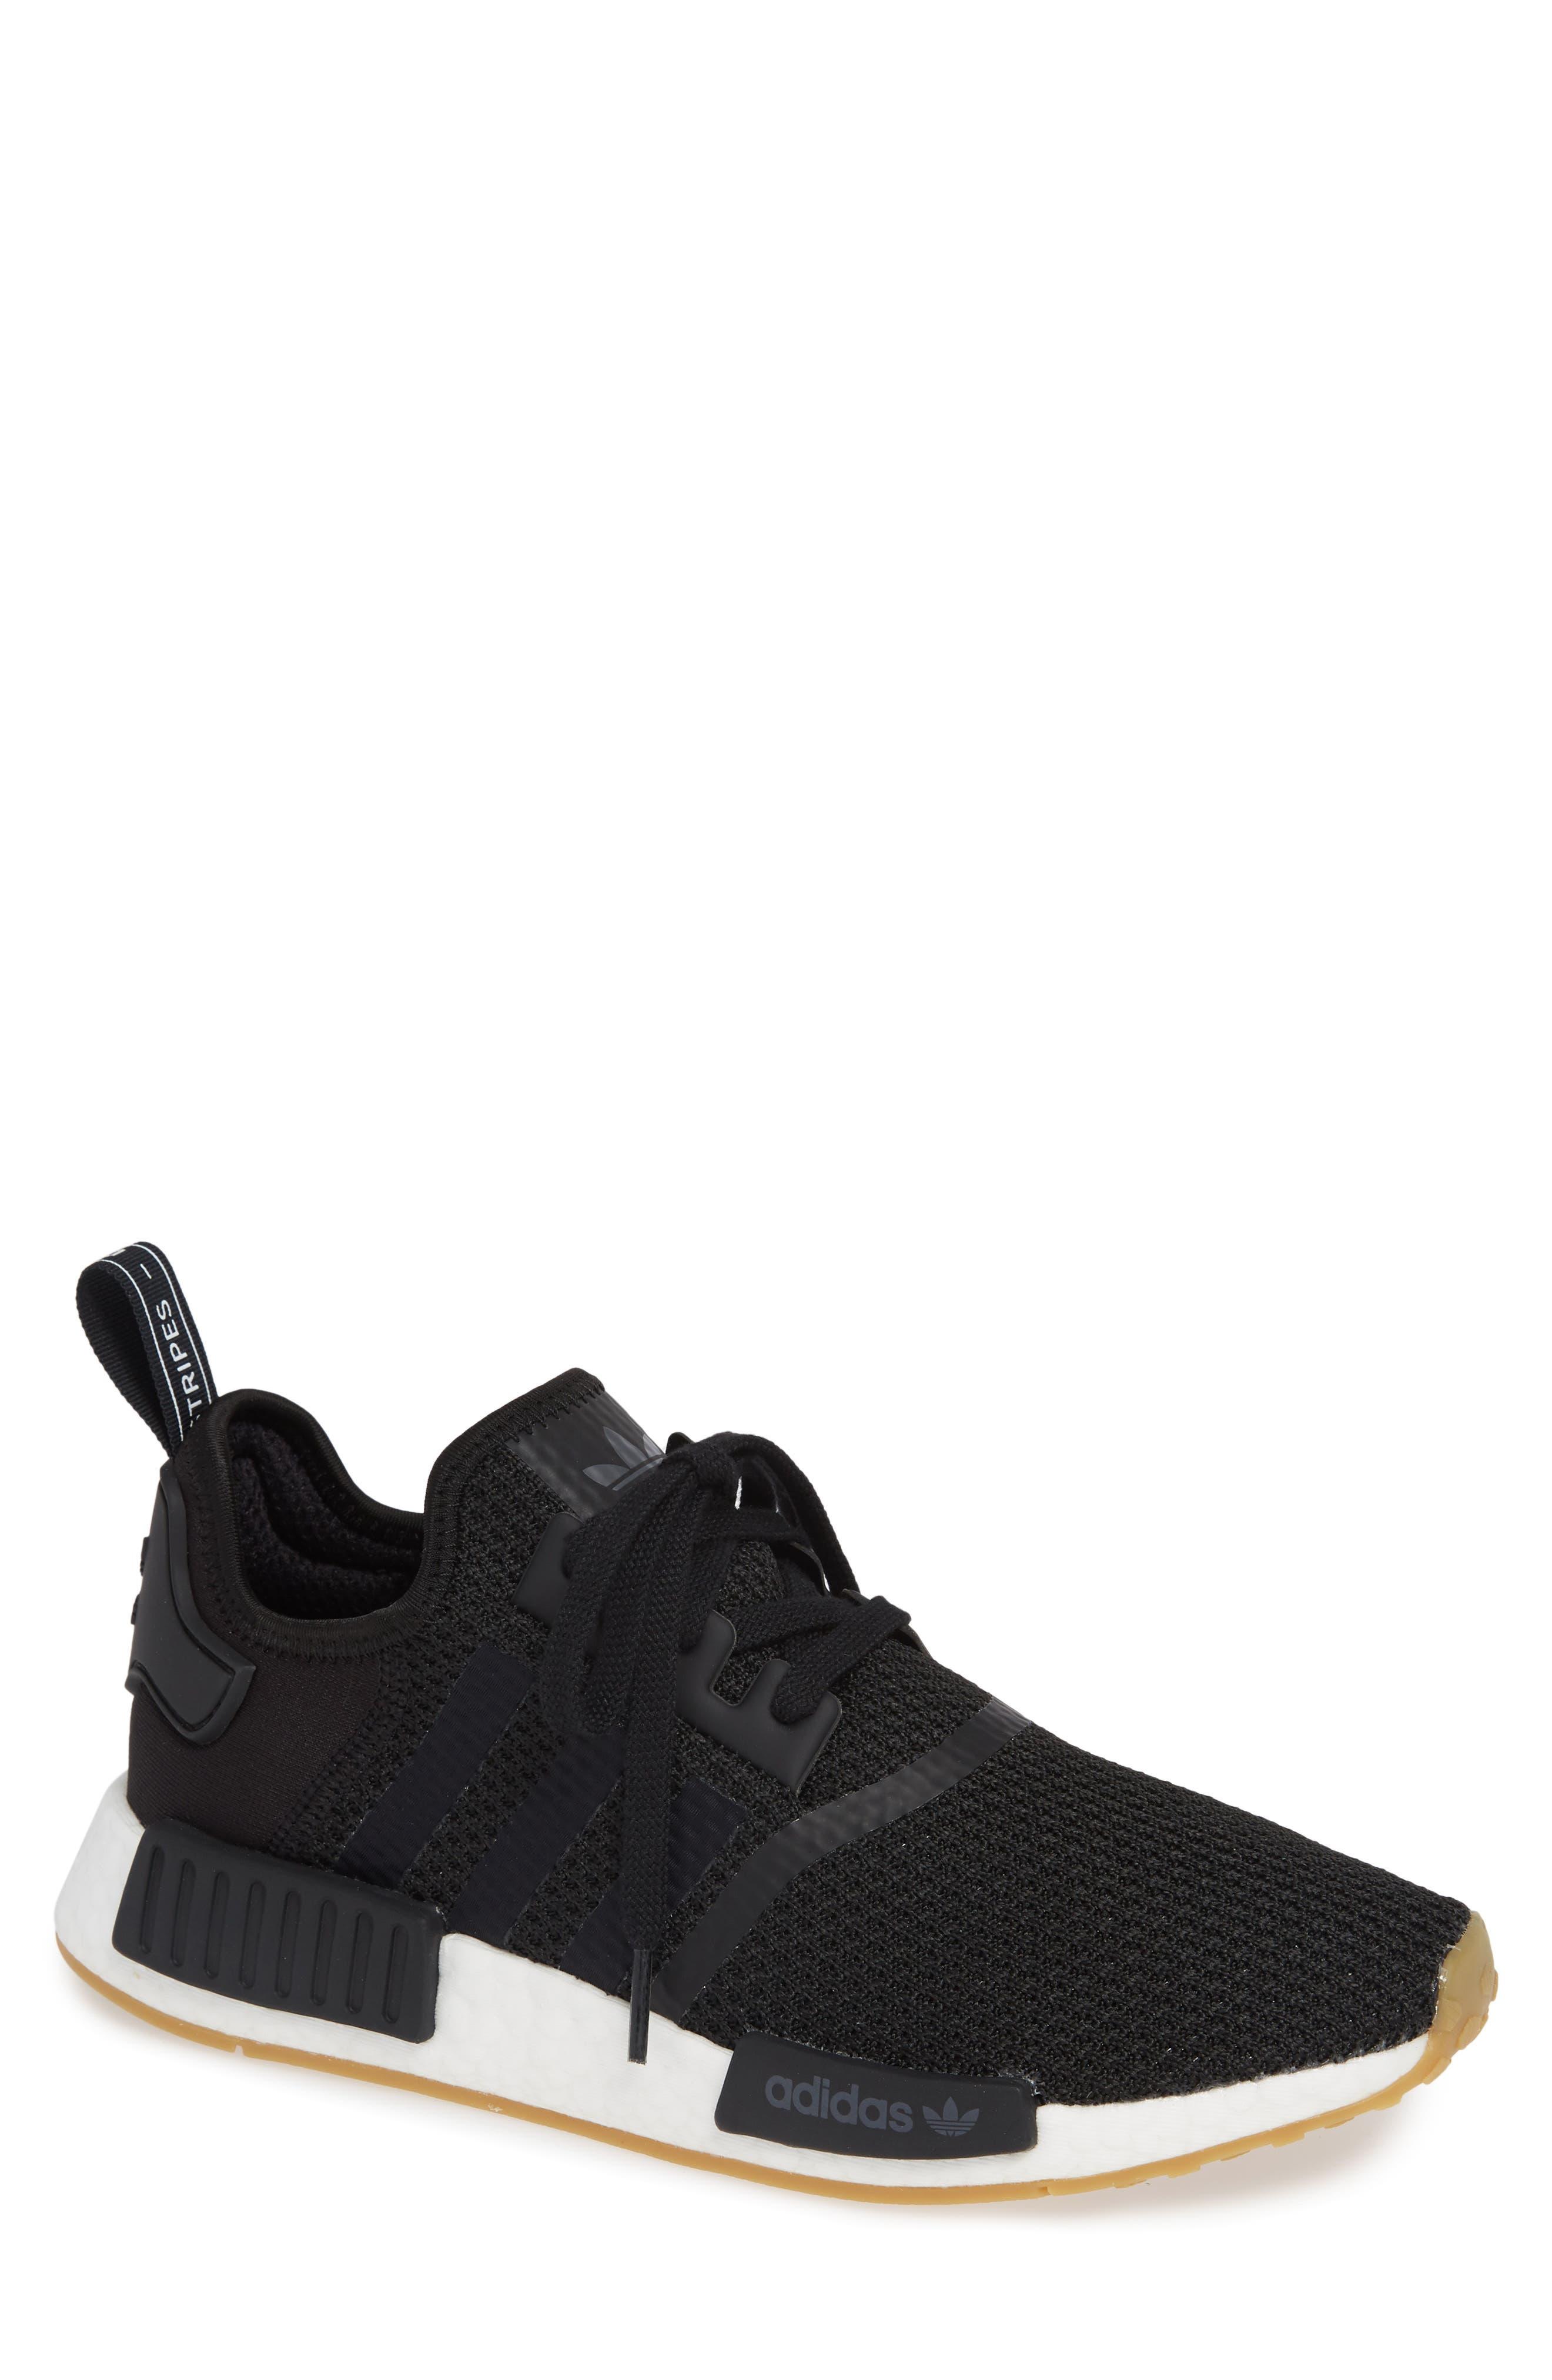 Originals NMD R1 Sneaker,                             Main thumbnail 1, color,                             BLACK/ BLACK/ GUM